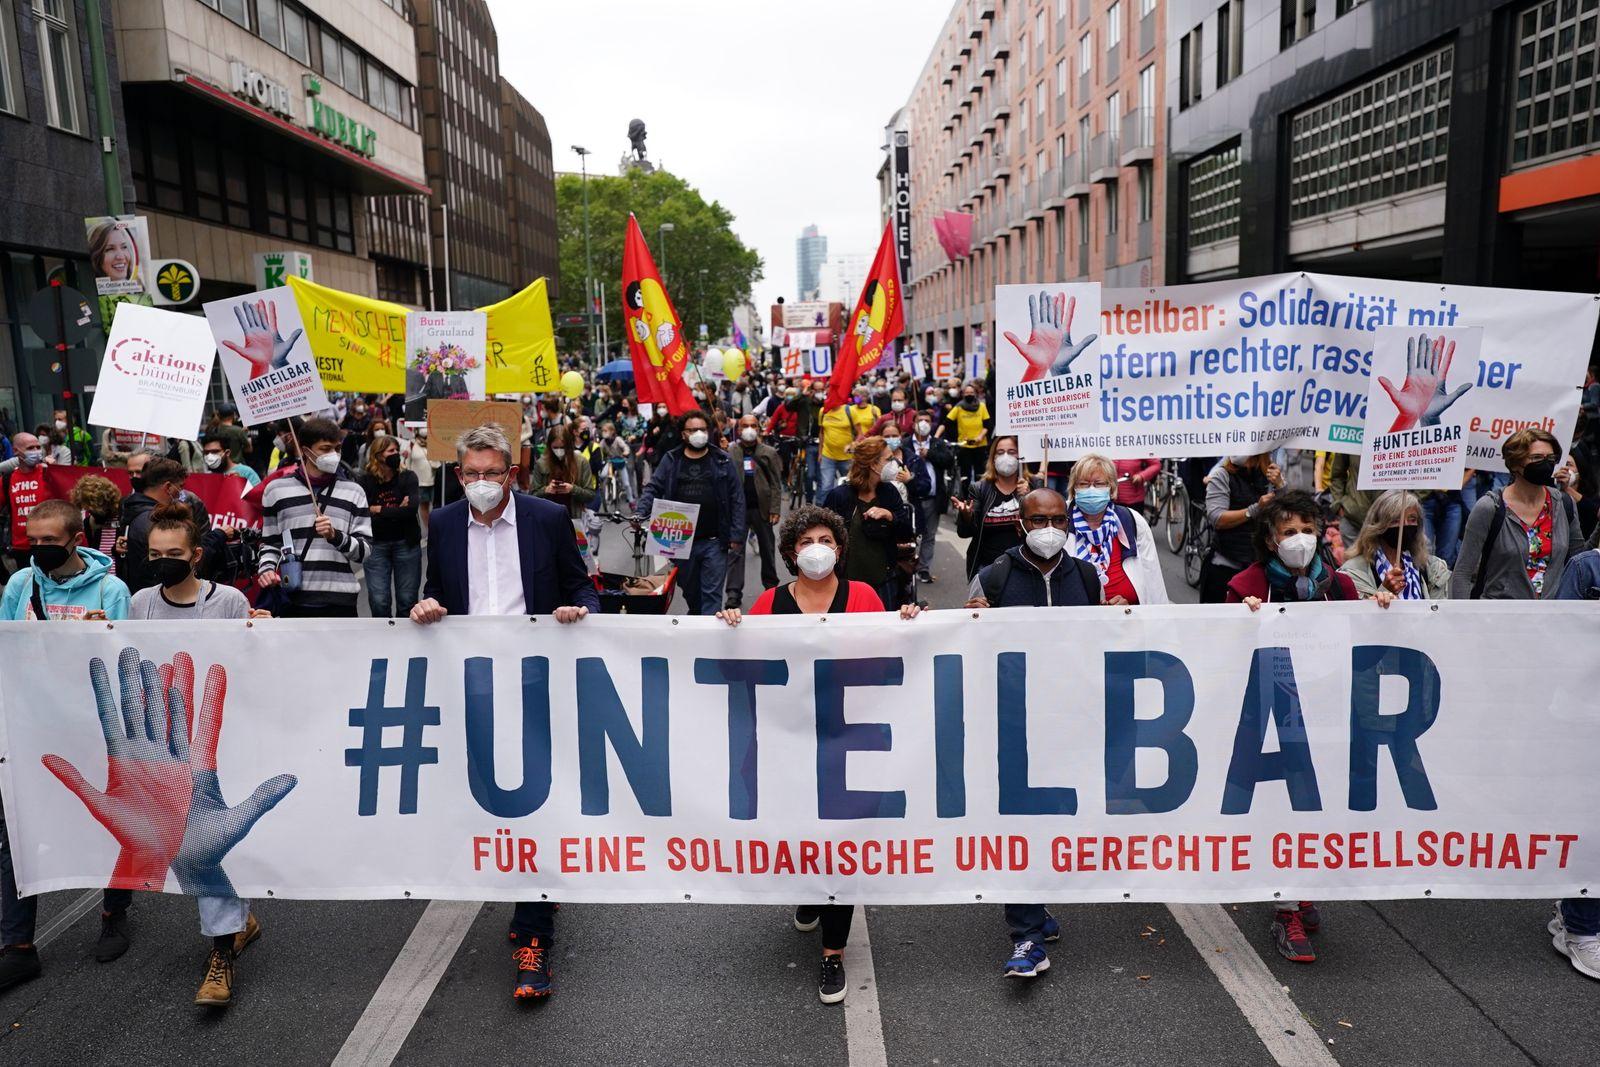 'Unteilbar' demonstration in Berlin